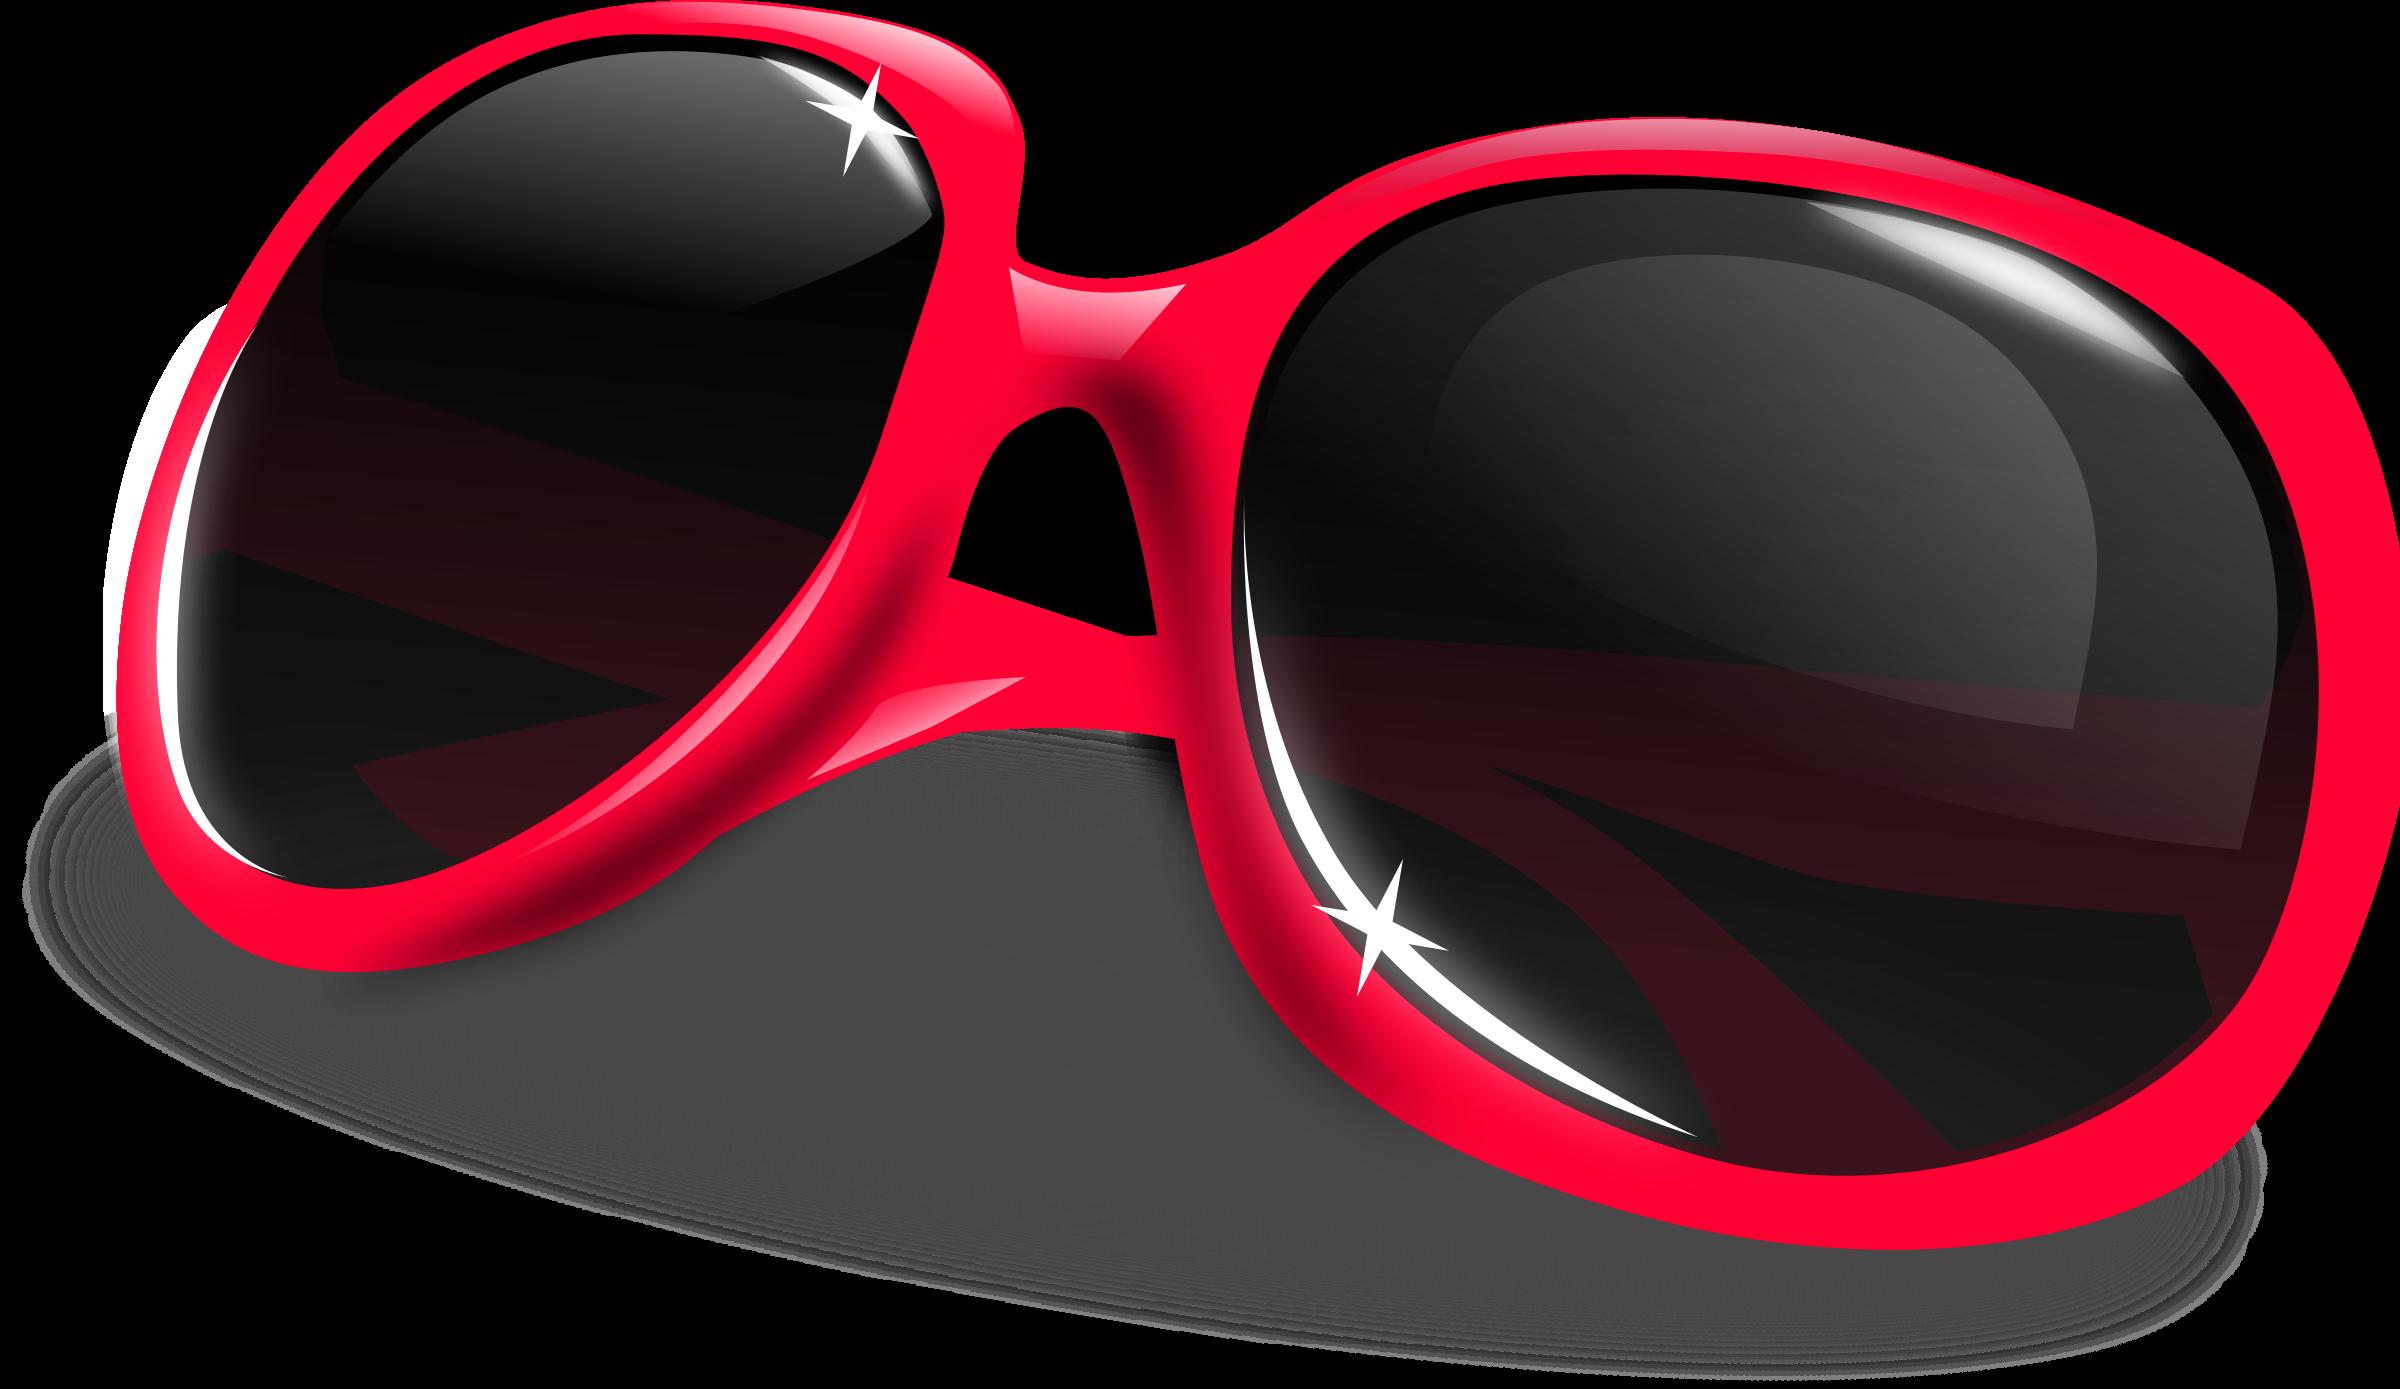 Glass clipart eye. Sunglasses